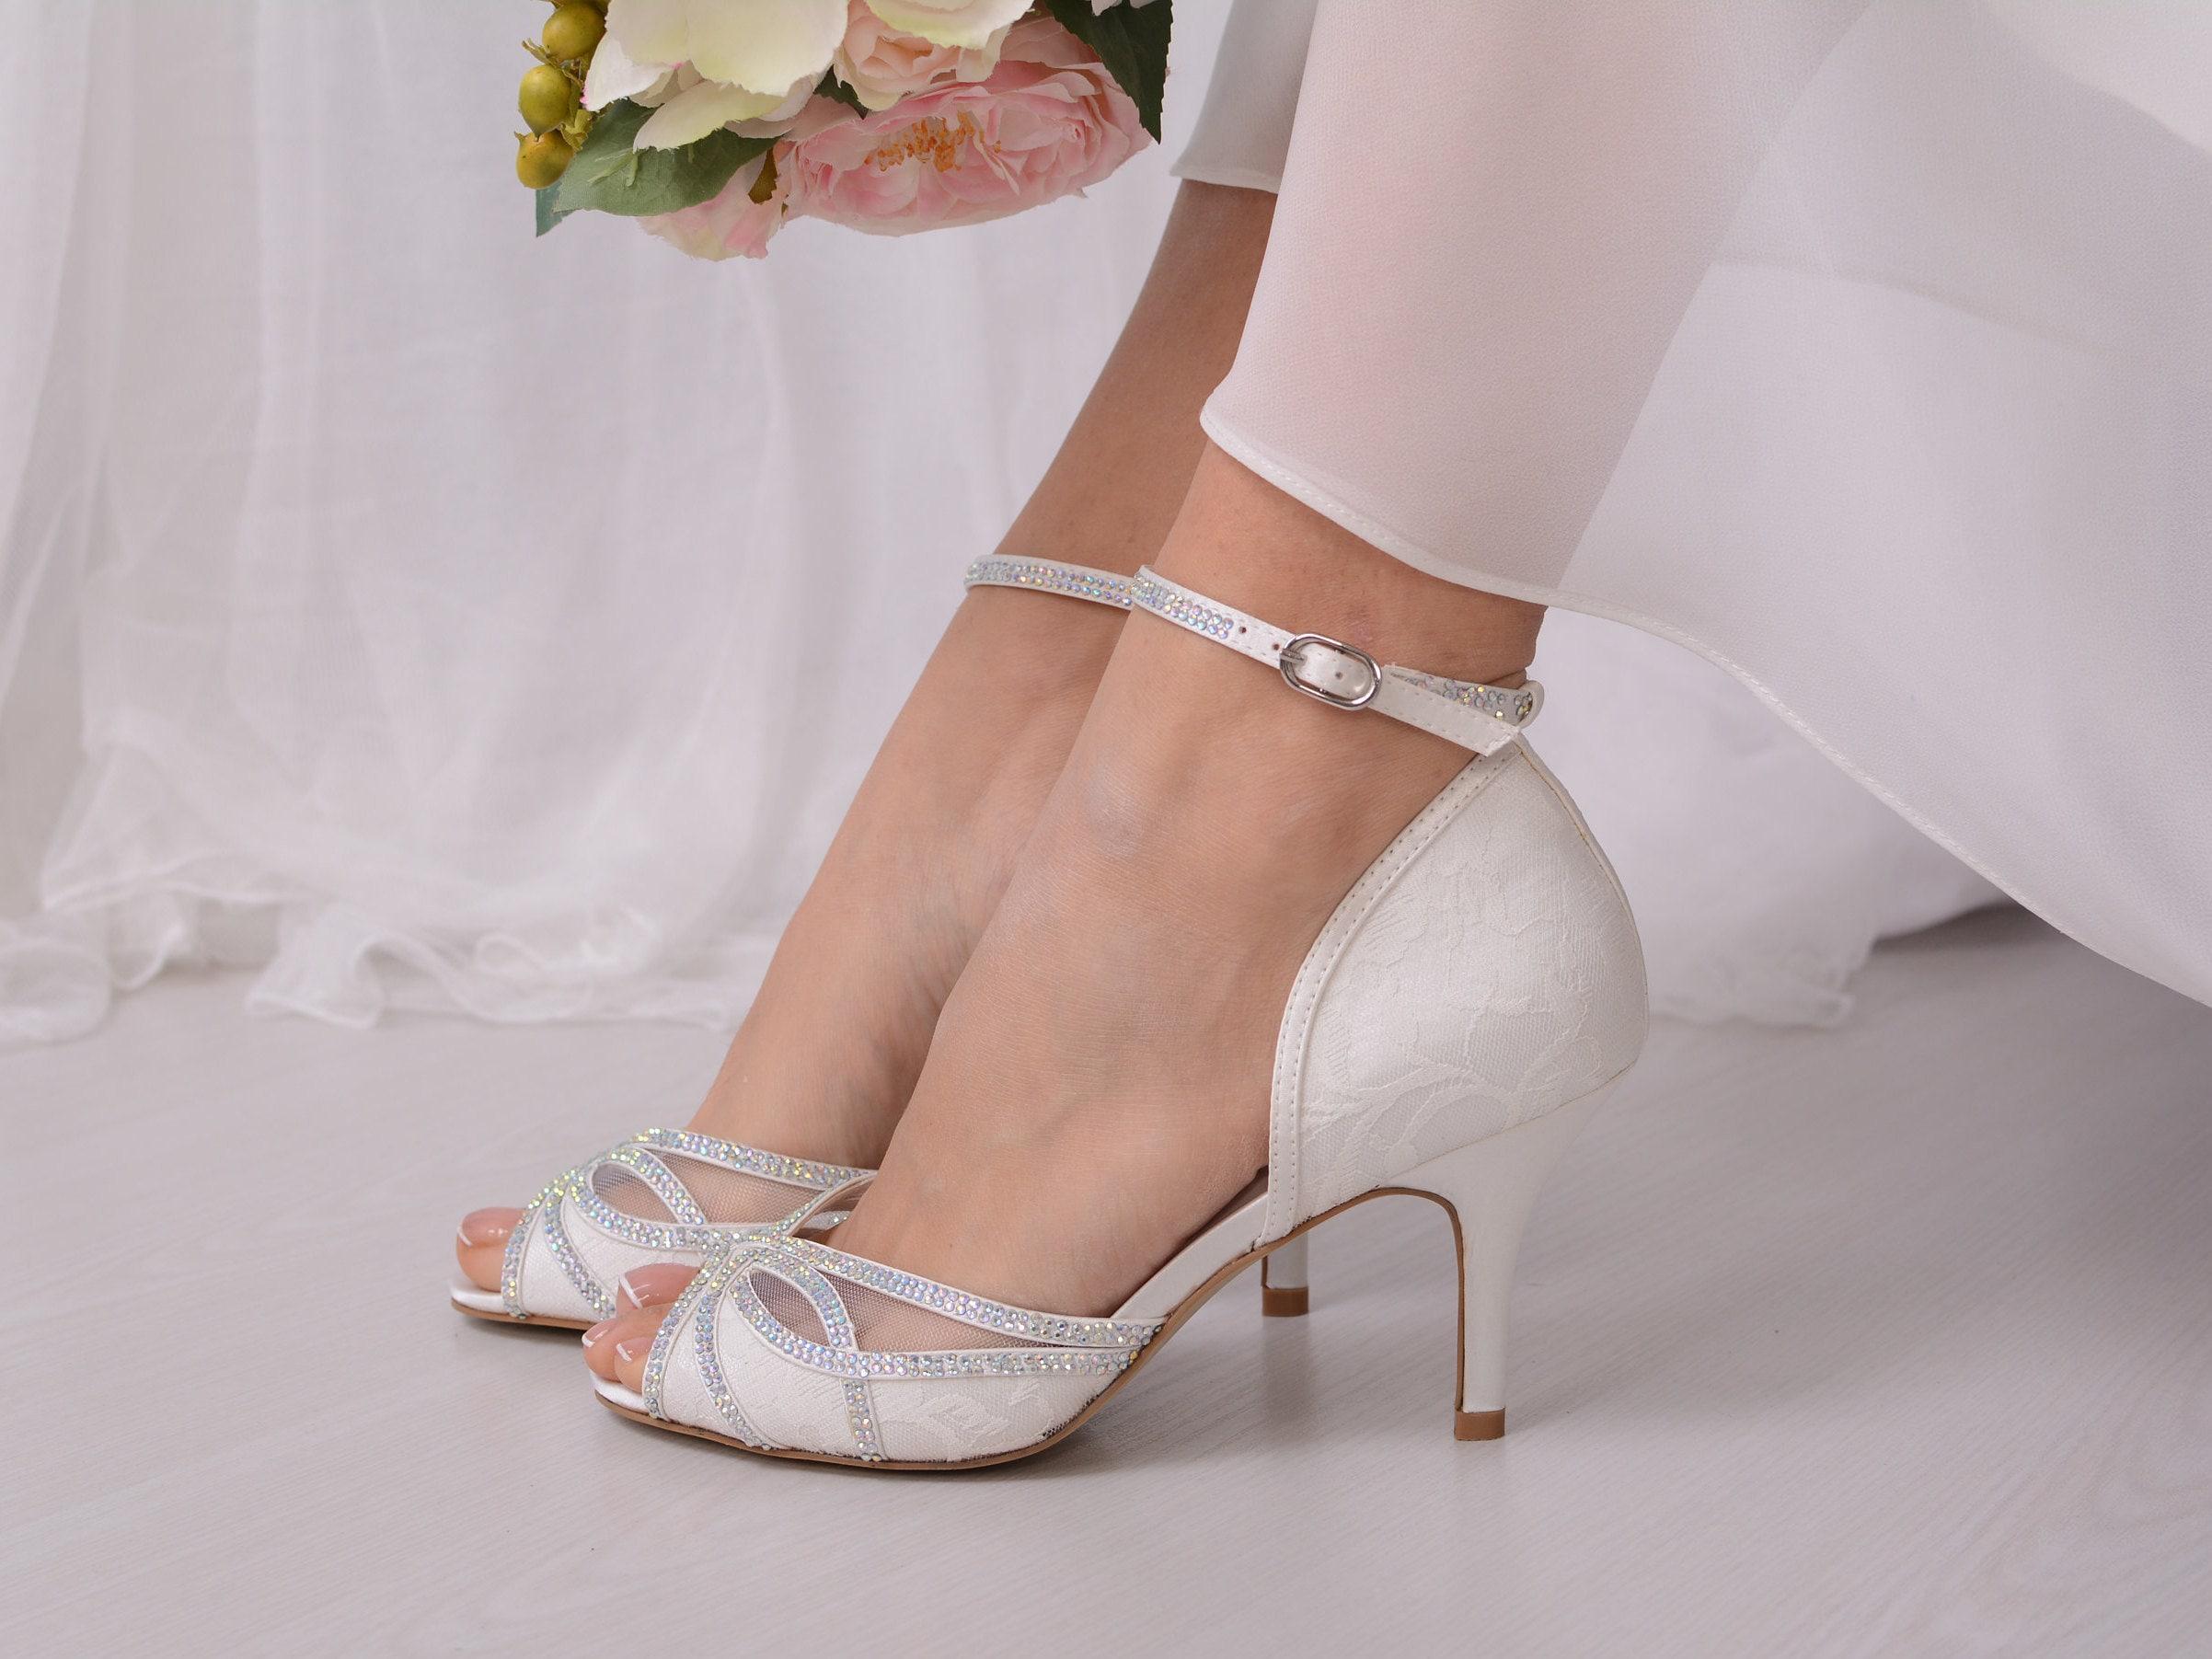 Ivory Wedding Heels For Bride Lace Bridal Wedding Shoes Bridal